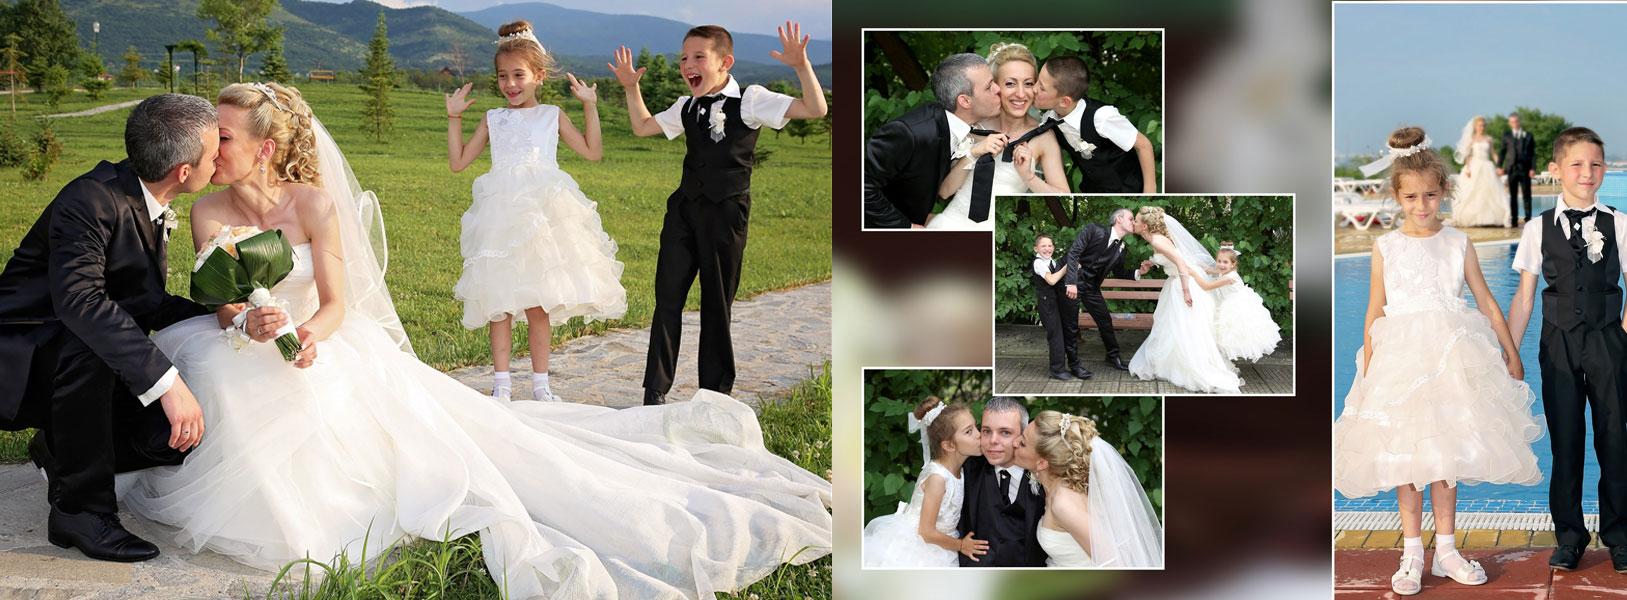 Drag Studio | Детска и сватбена фотография. | 18-19.jpg